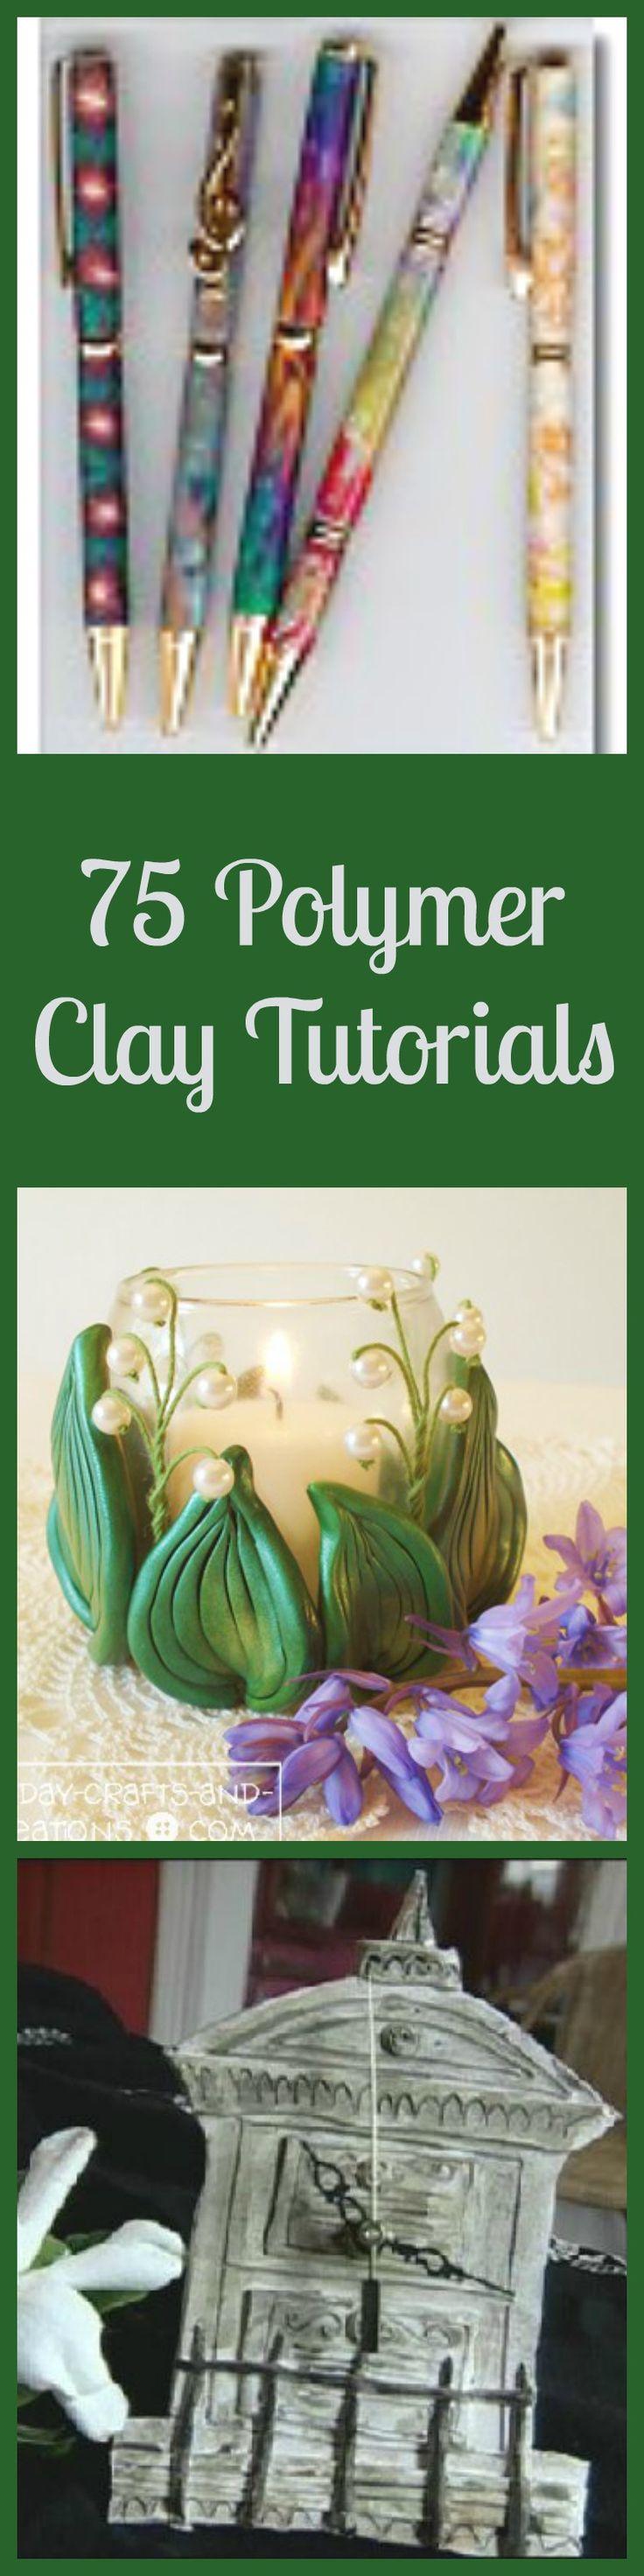 75 Polymer Clay Tutorials